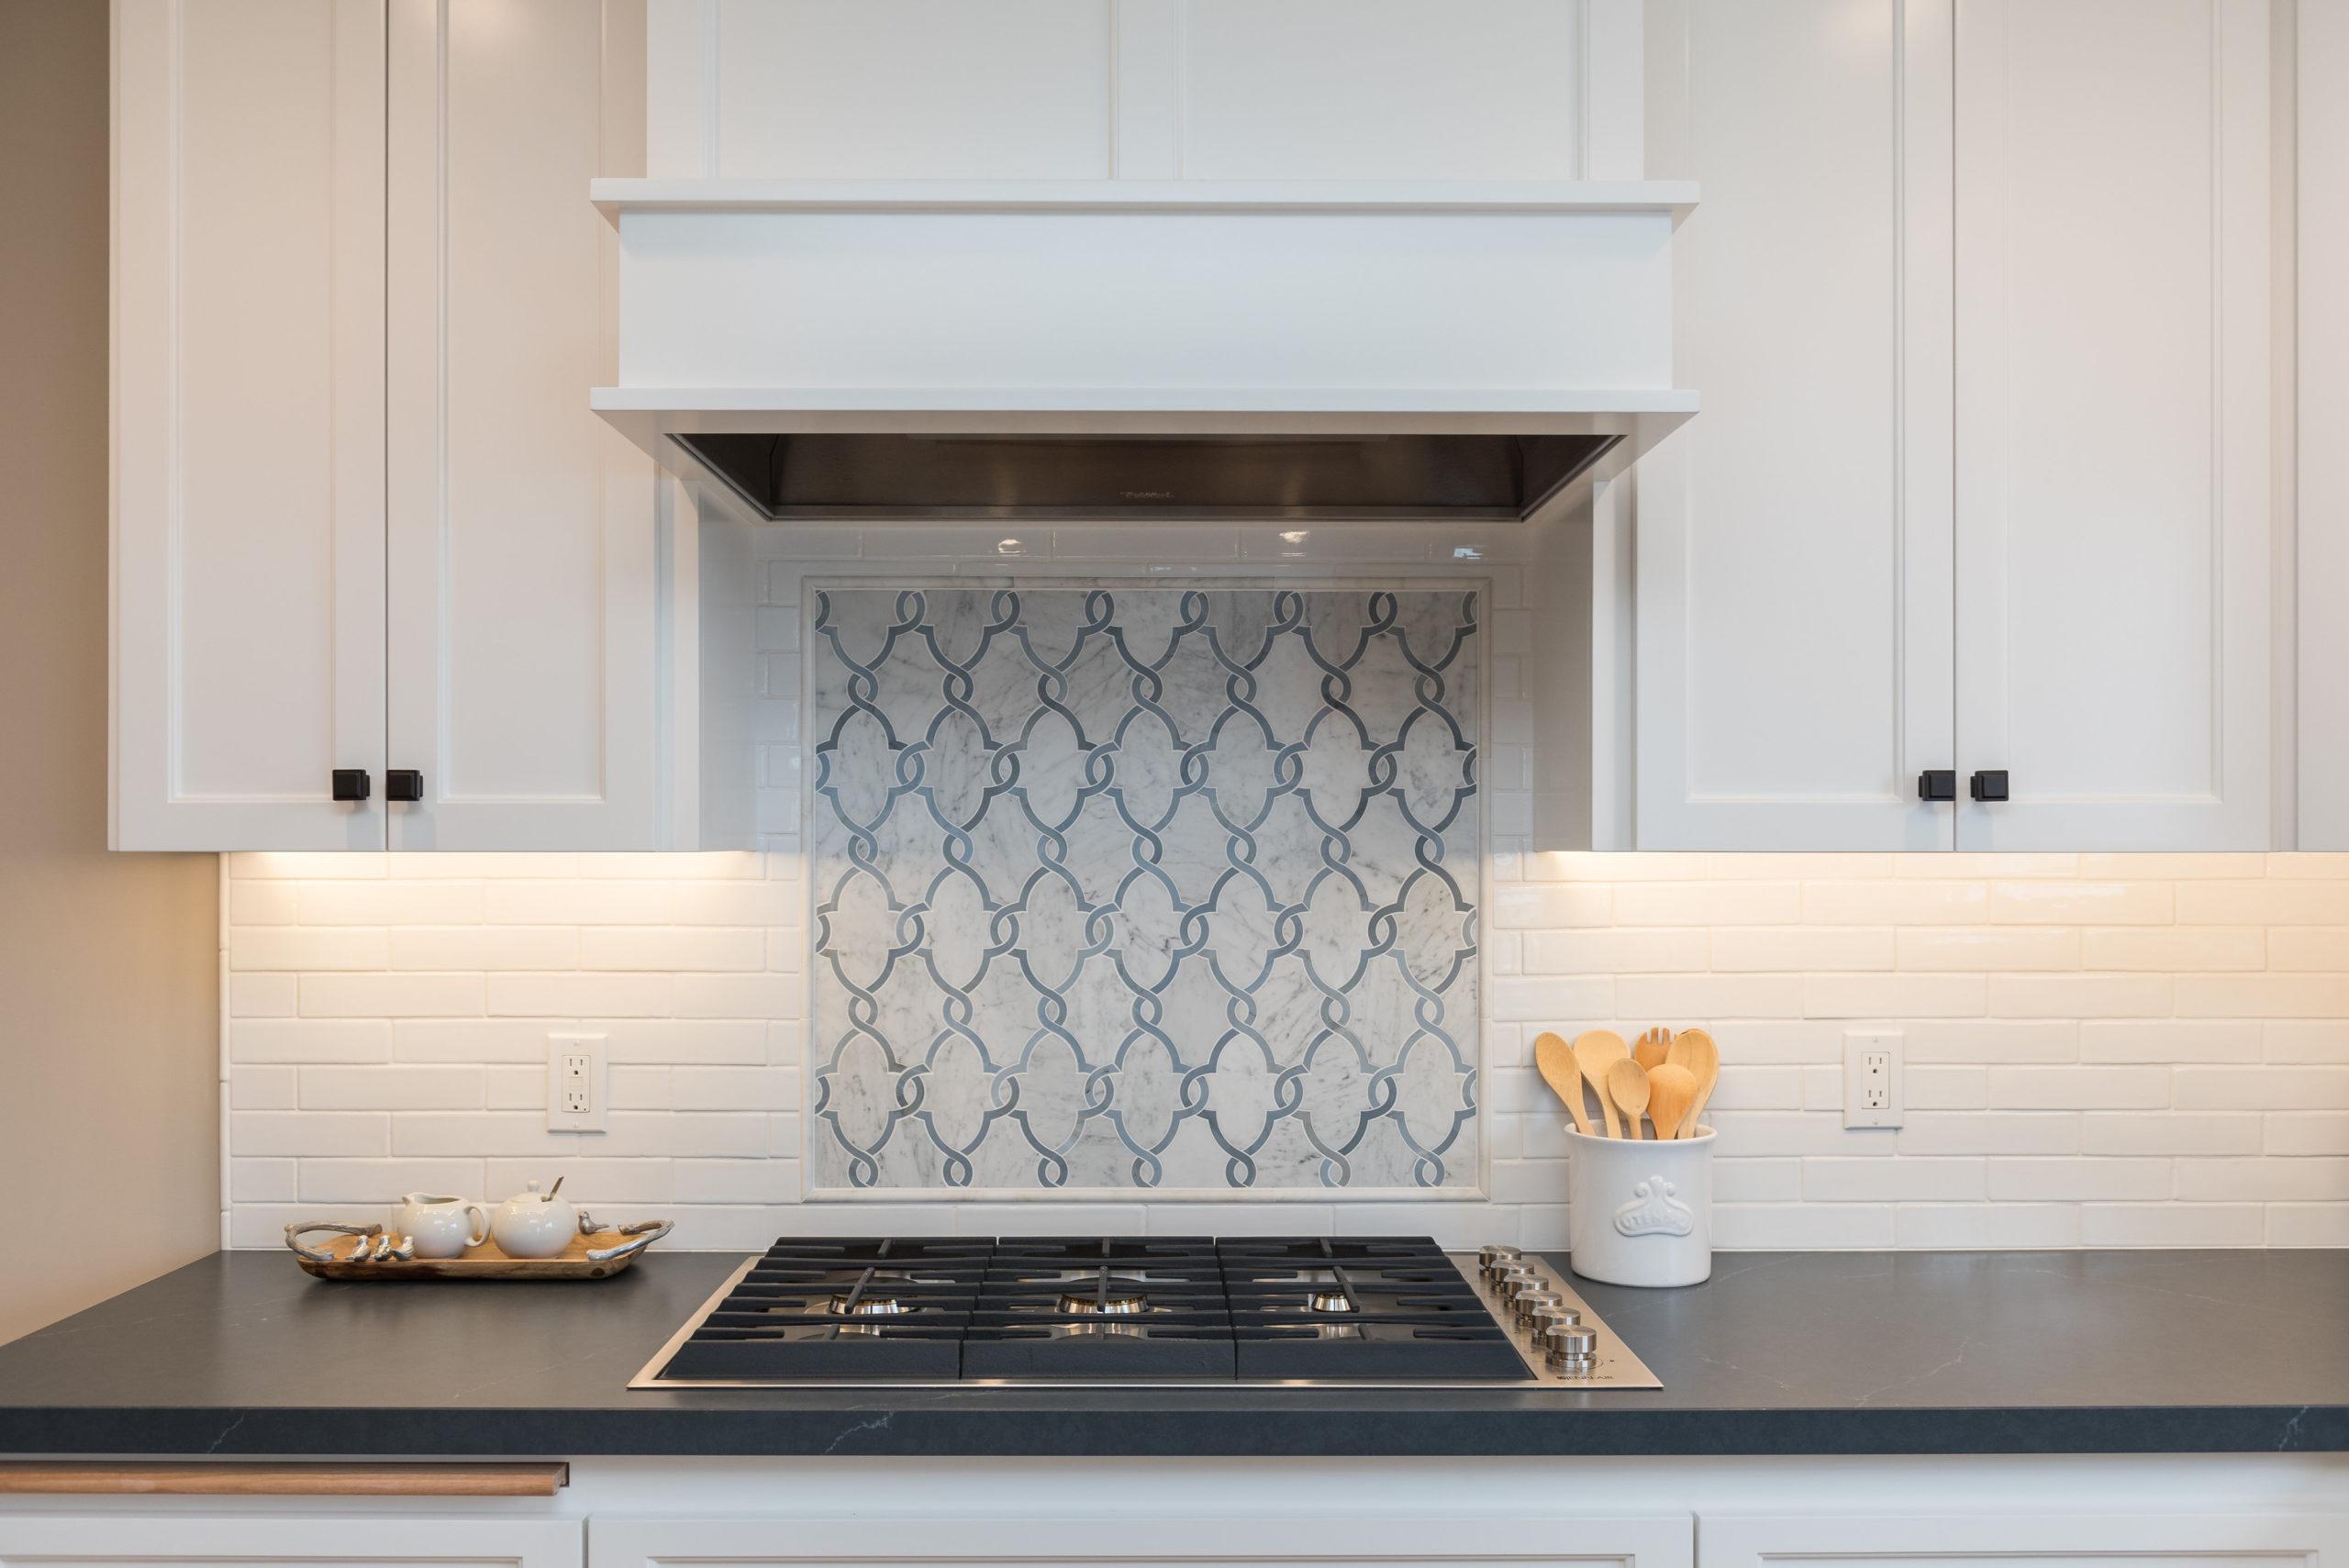 Silestone - Eternal Charcoal - Honeycomb Home Design - Marcel Alain Photography